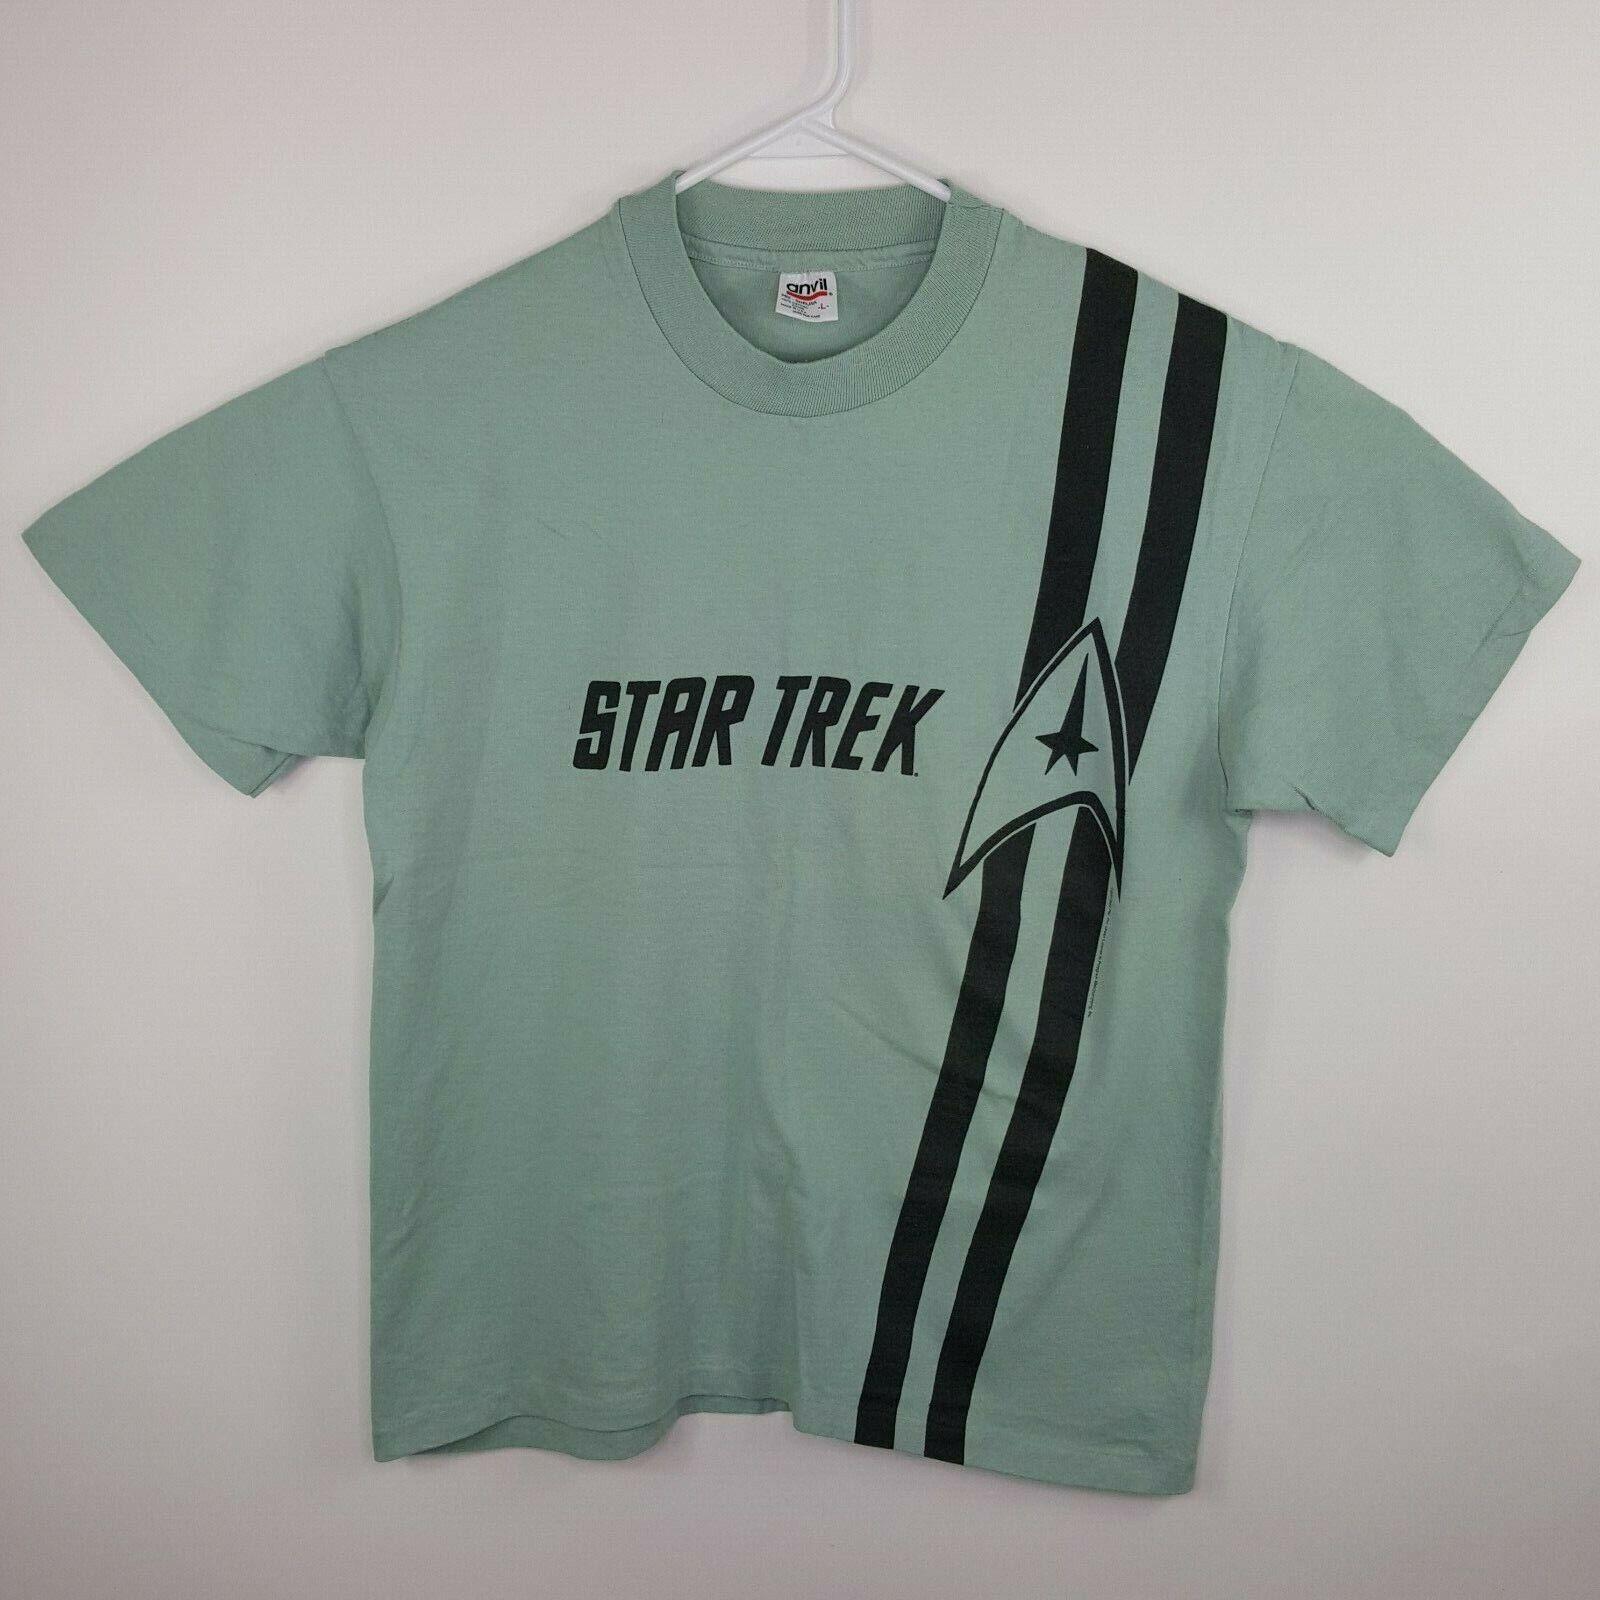 Vintage 1996 Men's Star Trek USA Made Single Stitch Light Green T Shirt Large L